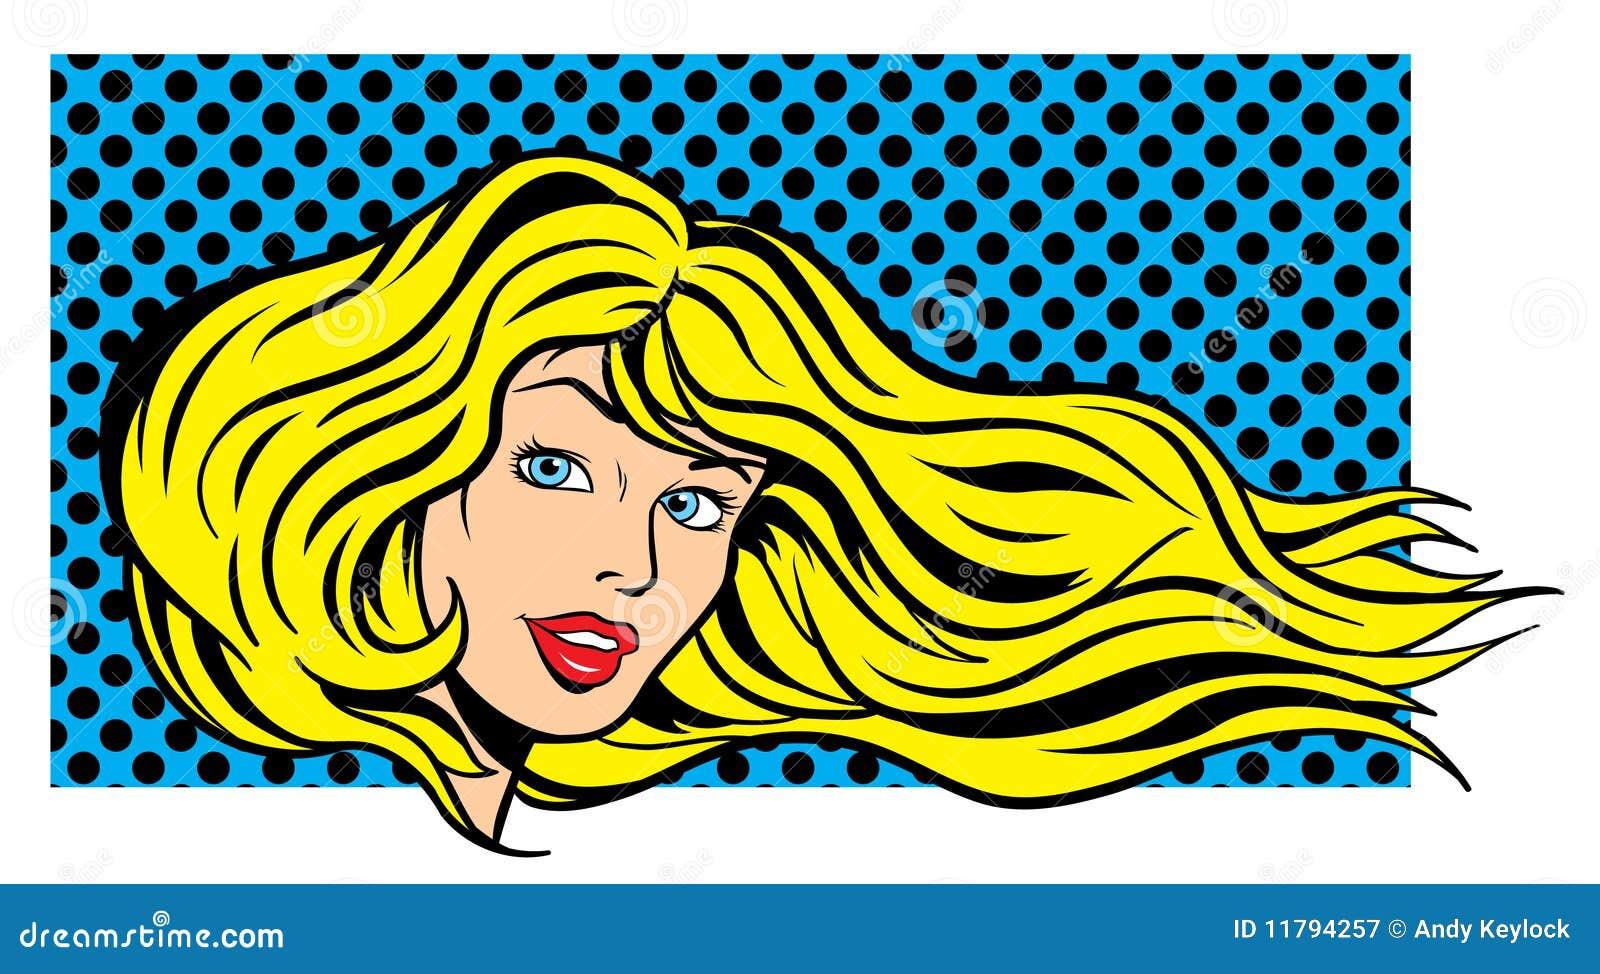 pop art woman face stock vector illustration of girl 43386483